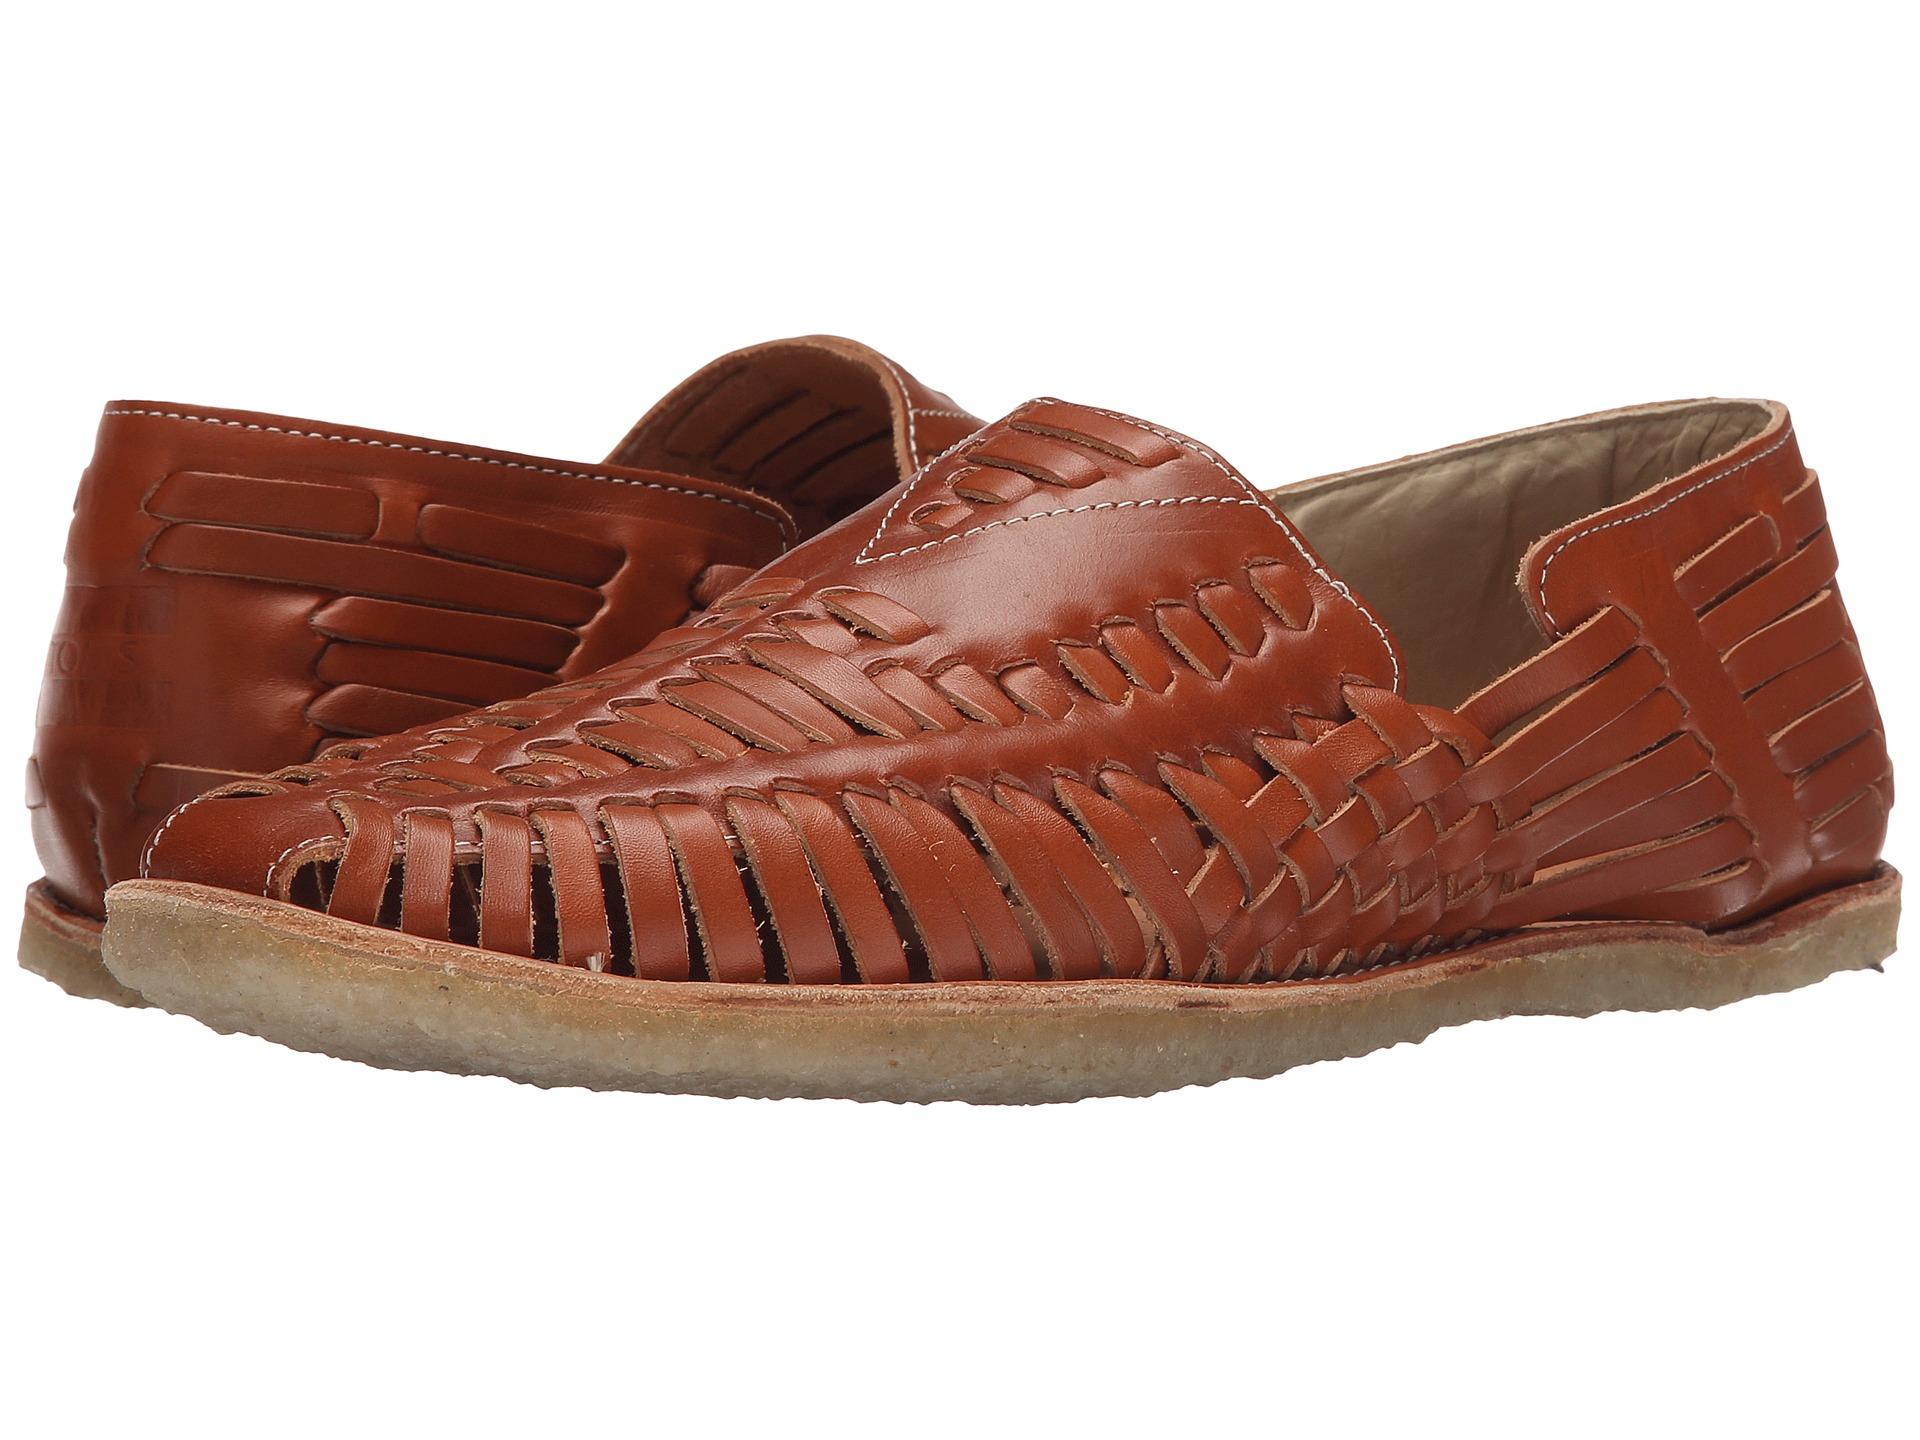 c2abf5d1ccc7a Men's Brown Huarache Slip-on